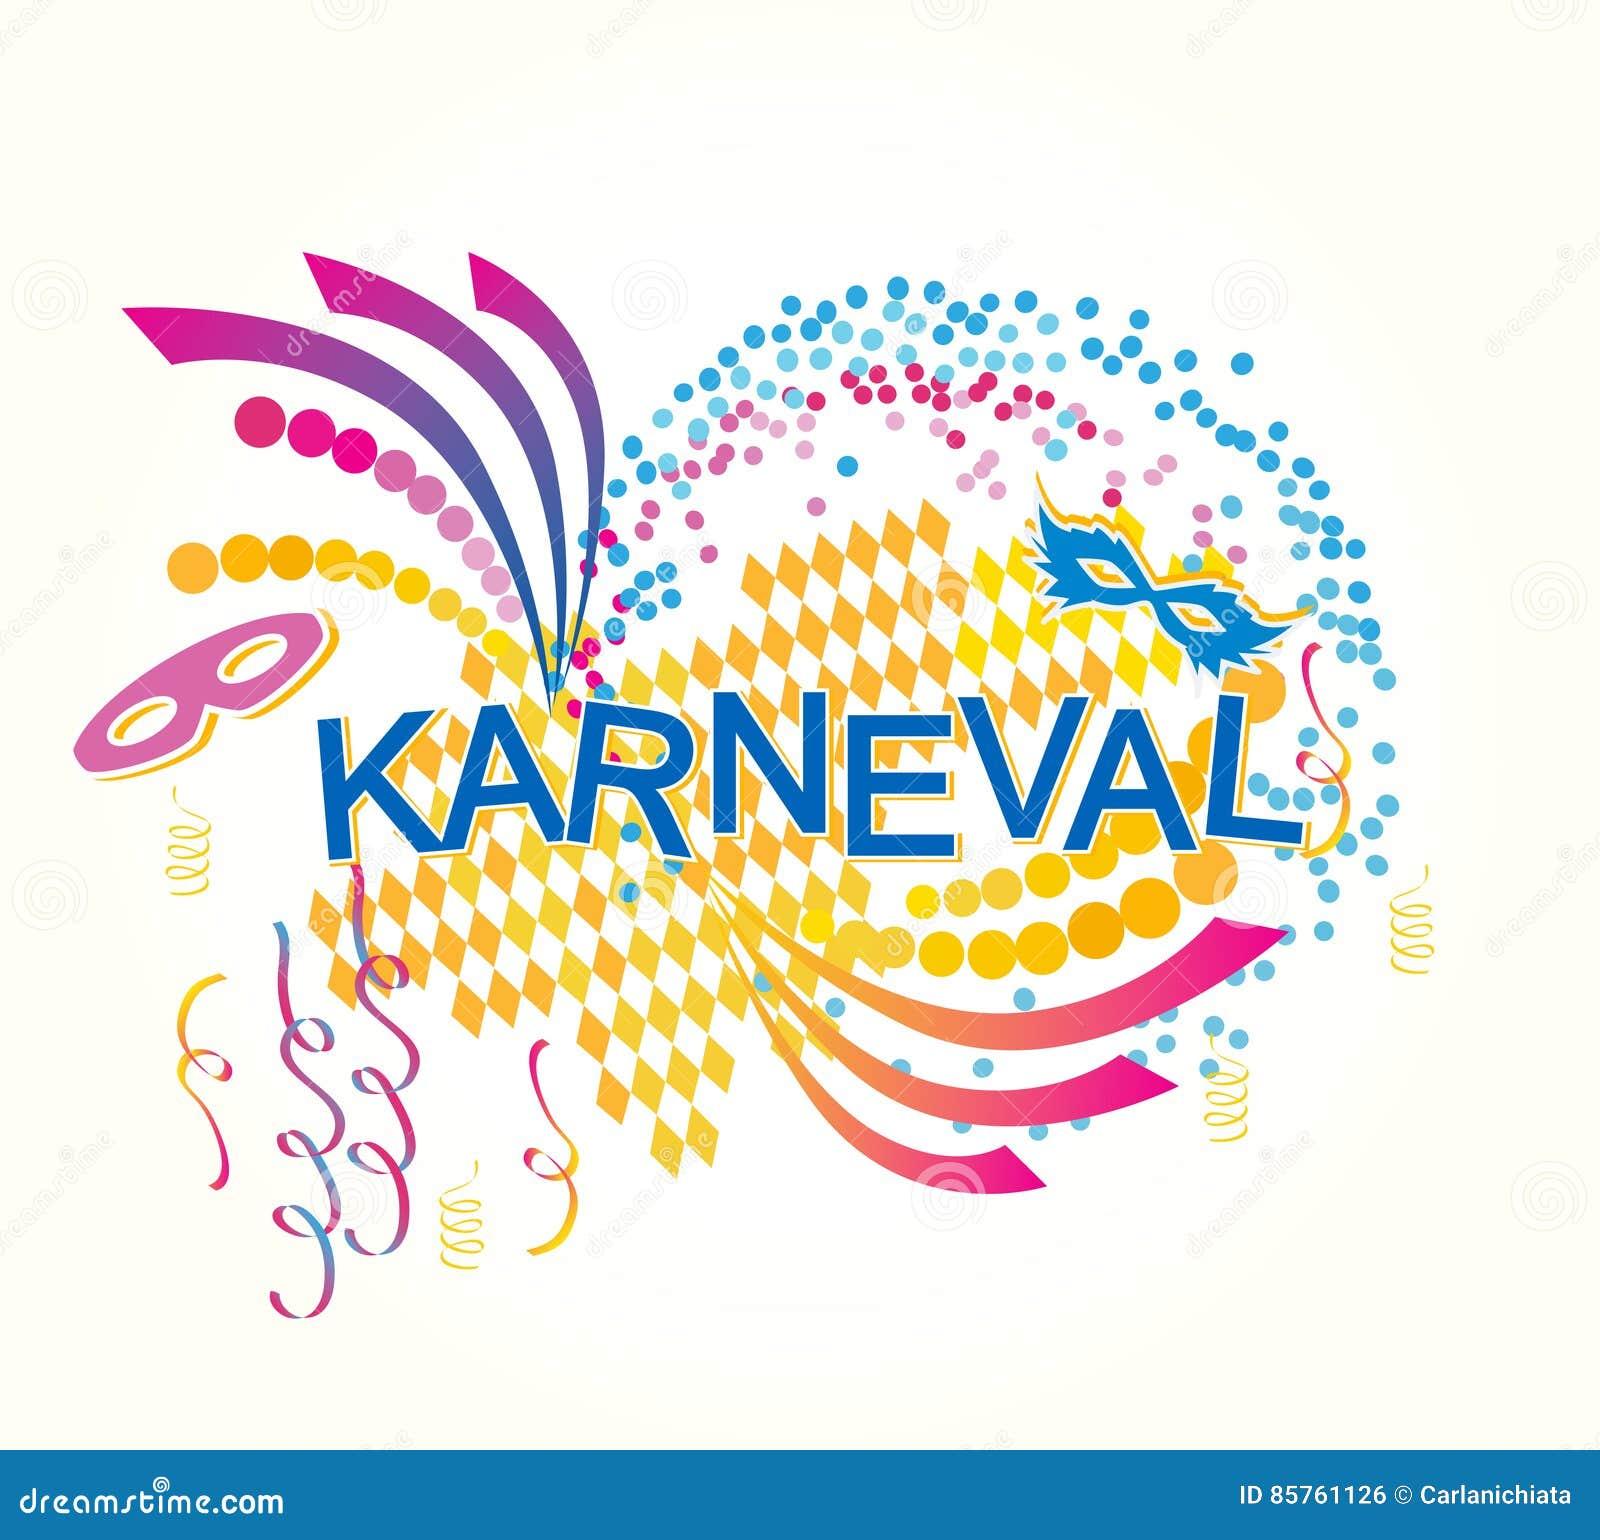 German Karneval Stock Vector Illustration Of Background 85761126